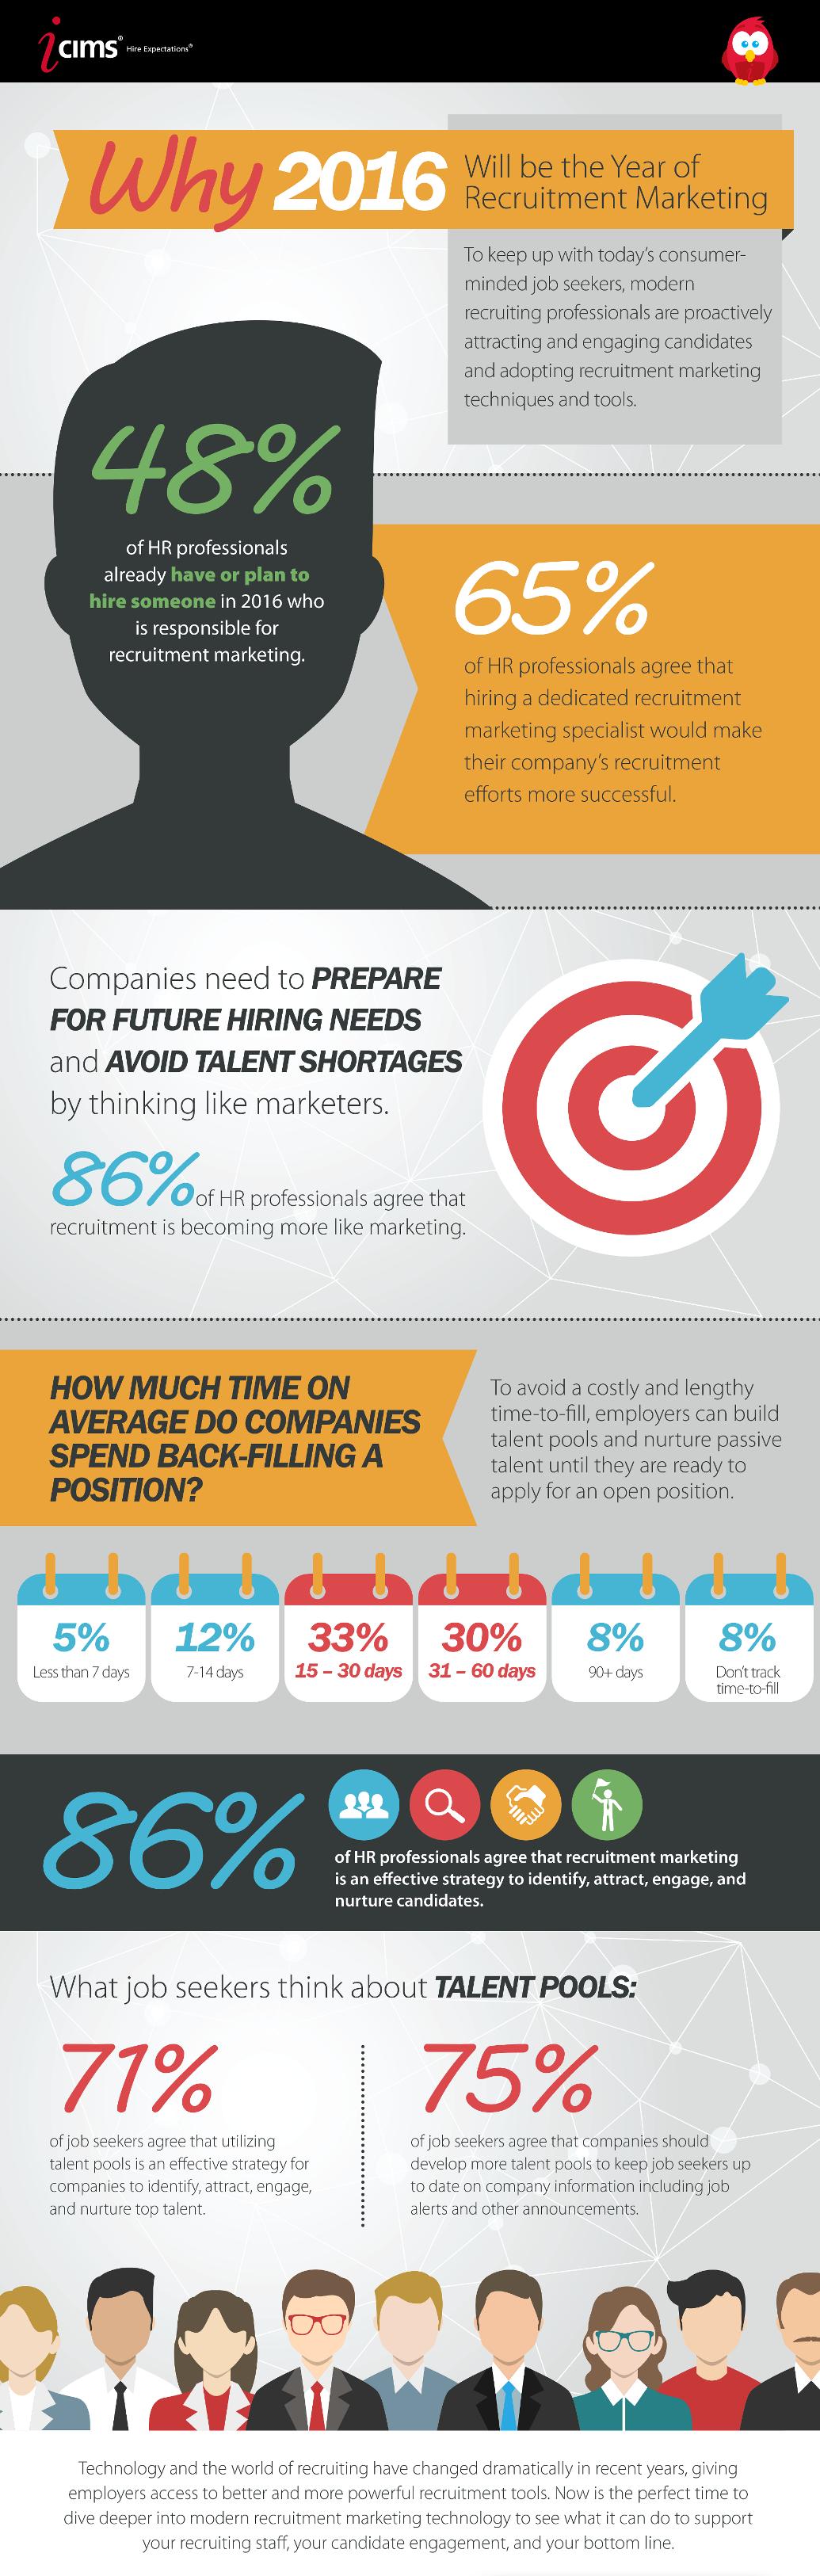 Include Recruitment Marketing In Hiring Strategies Infographic Recruitment Marketing Strategy Infographic Infographic Marketing